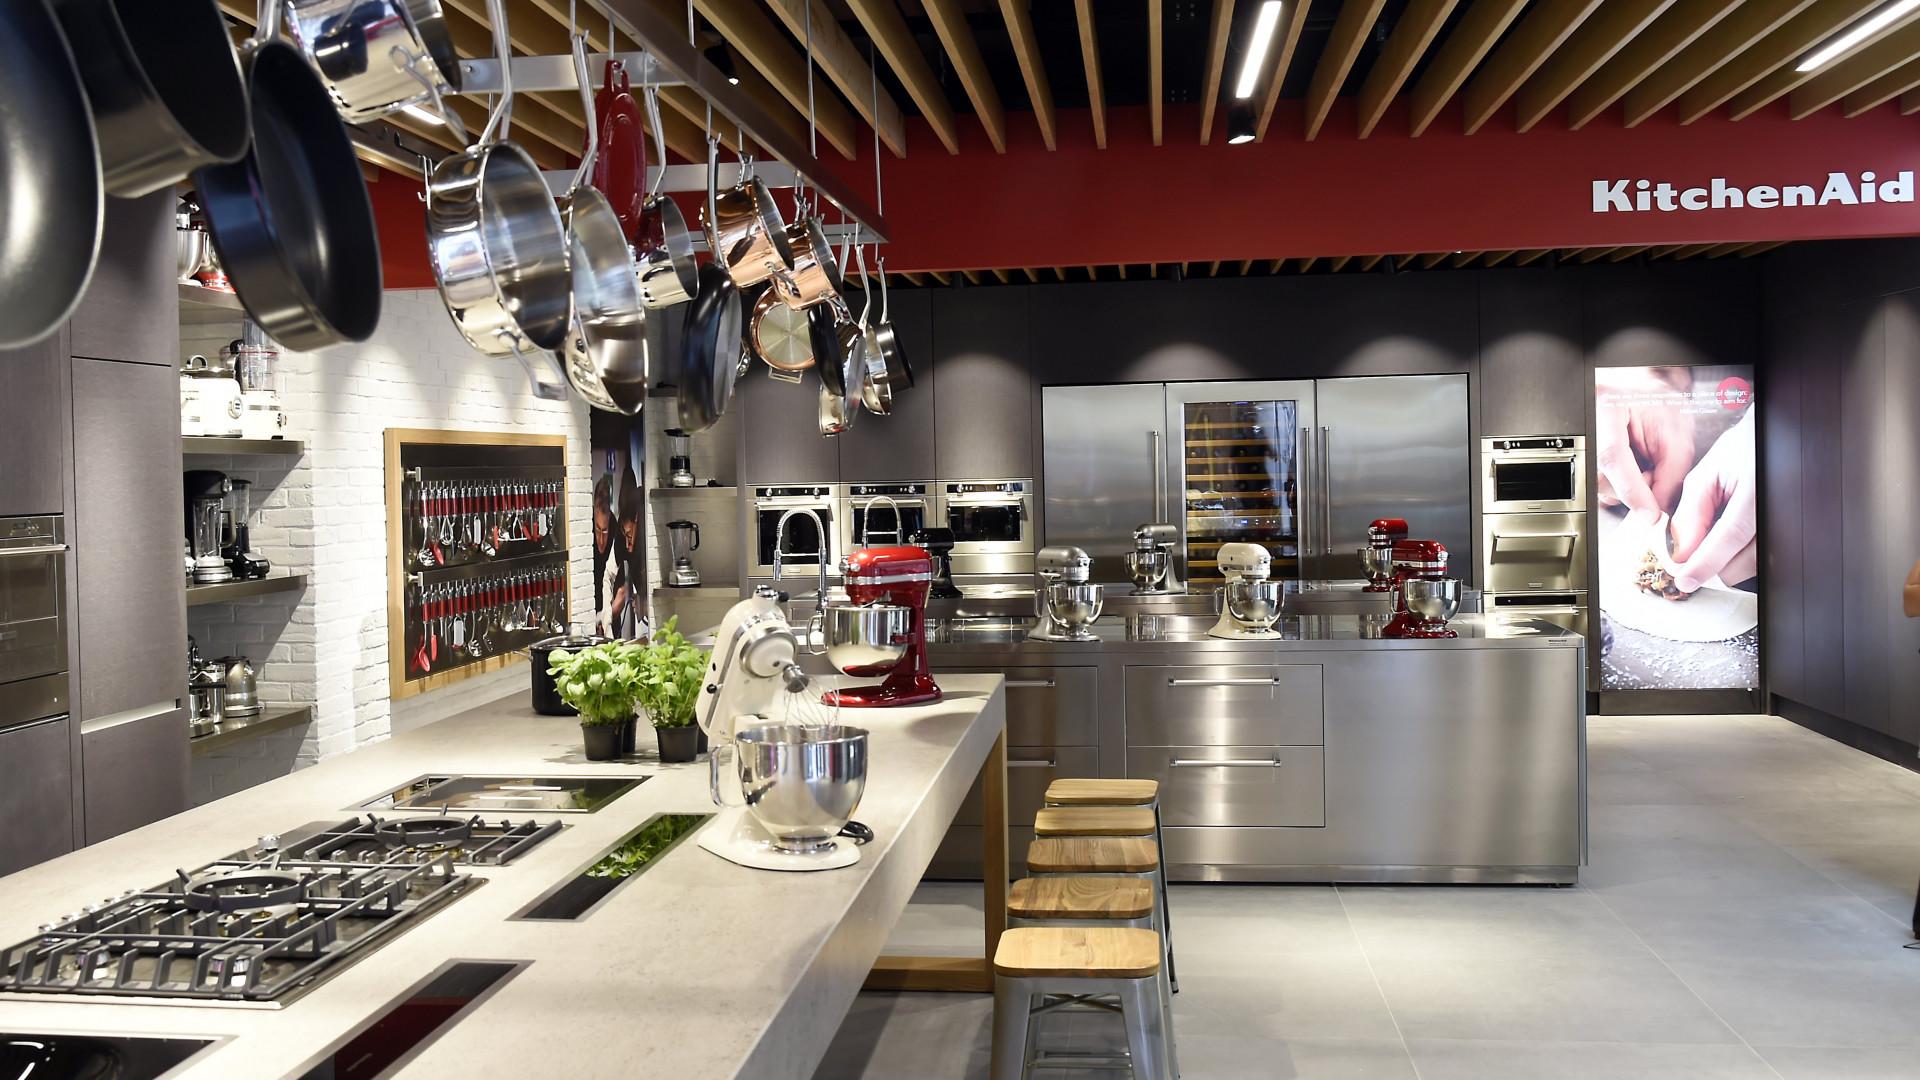 KitchenAid's Experience Store